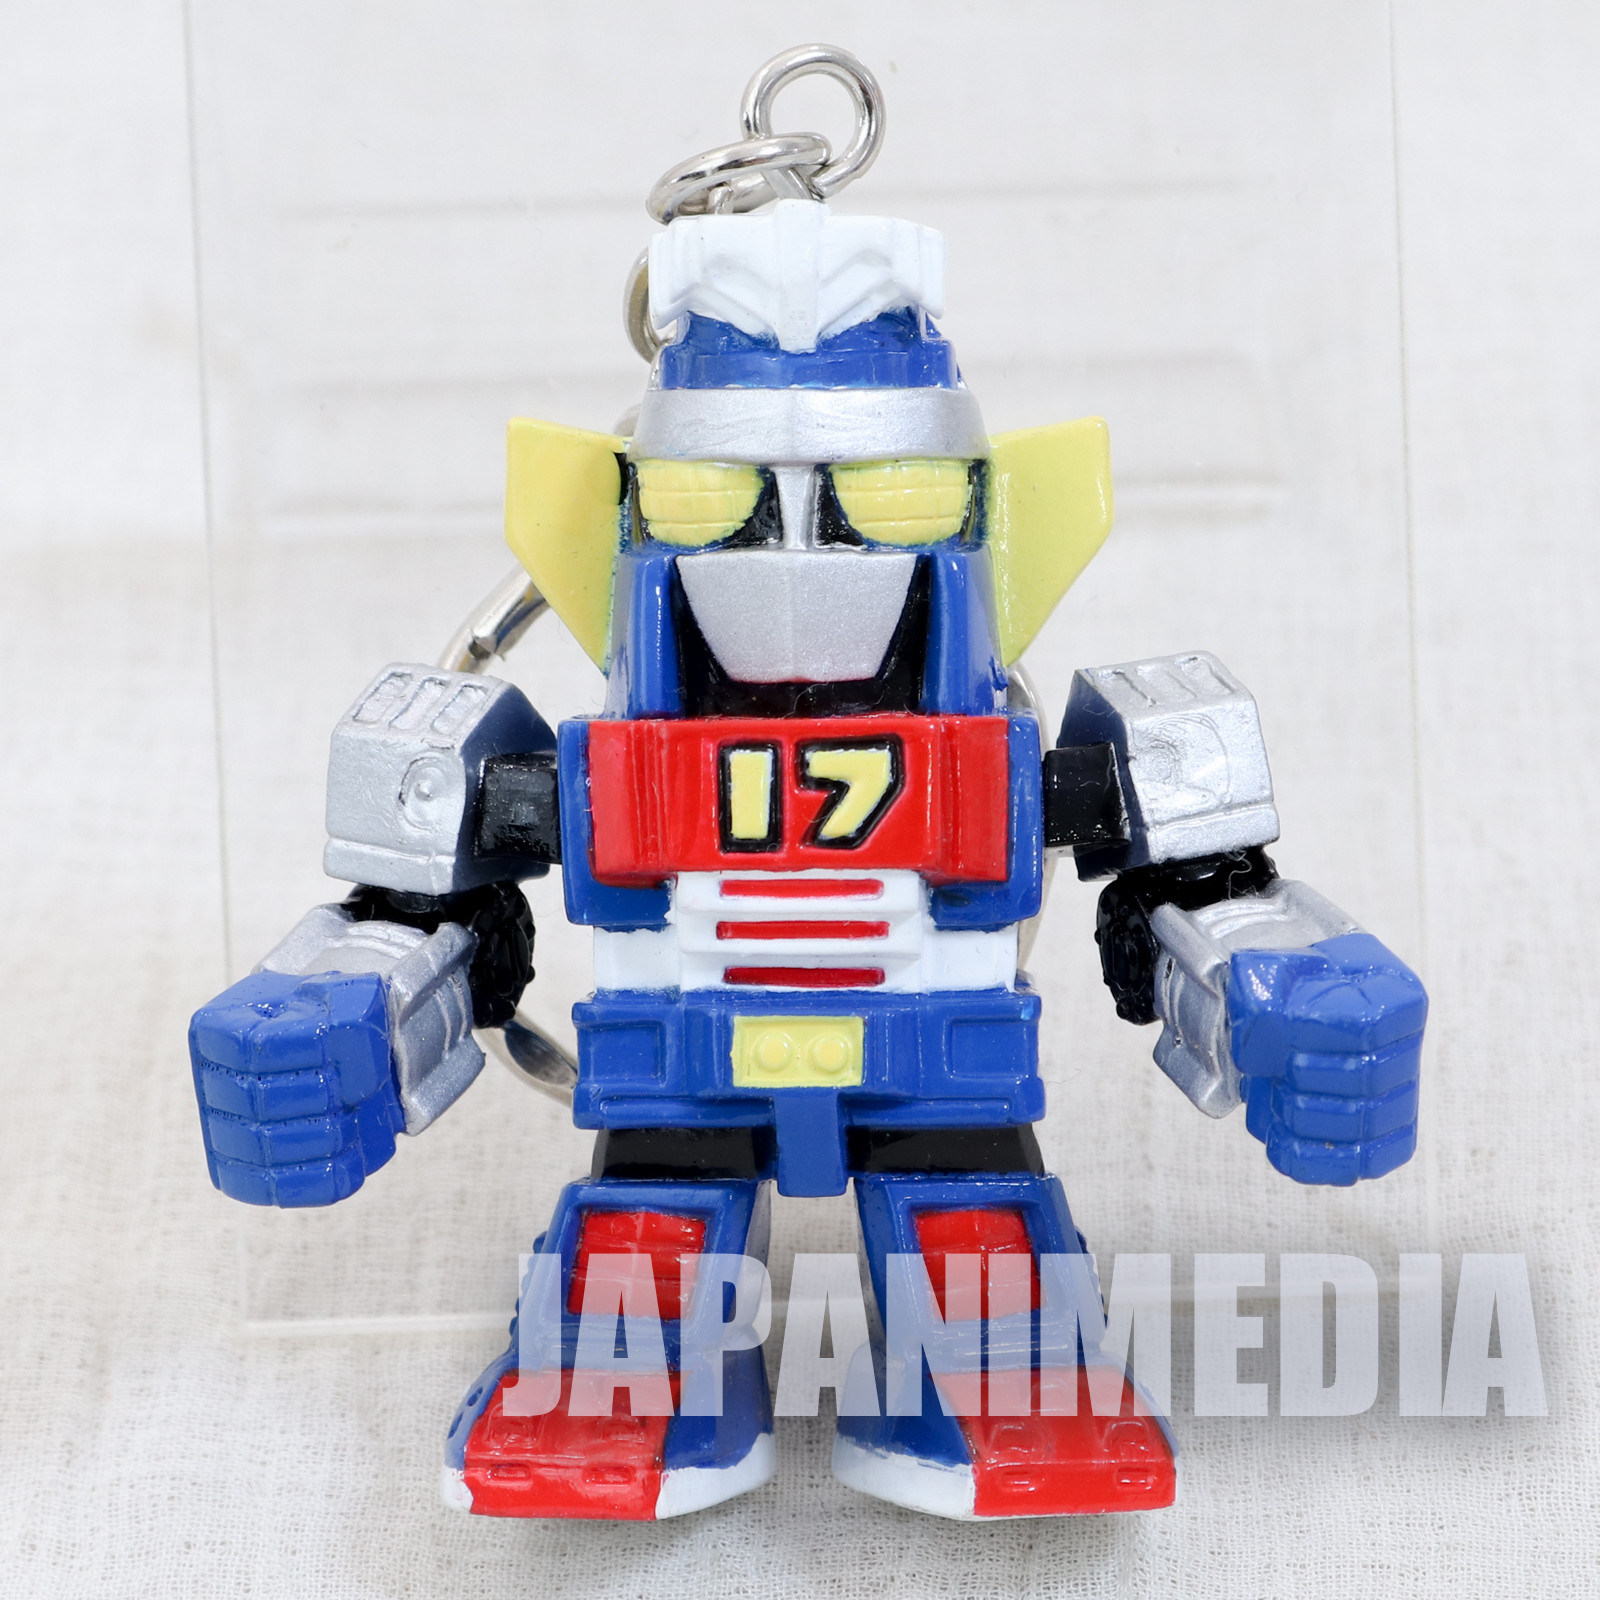 Daitetsujin 17 Figure Key Chian JAPAN ANIME TOKUSATSU ROBOT